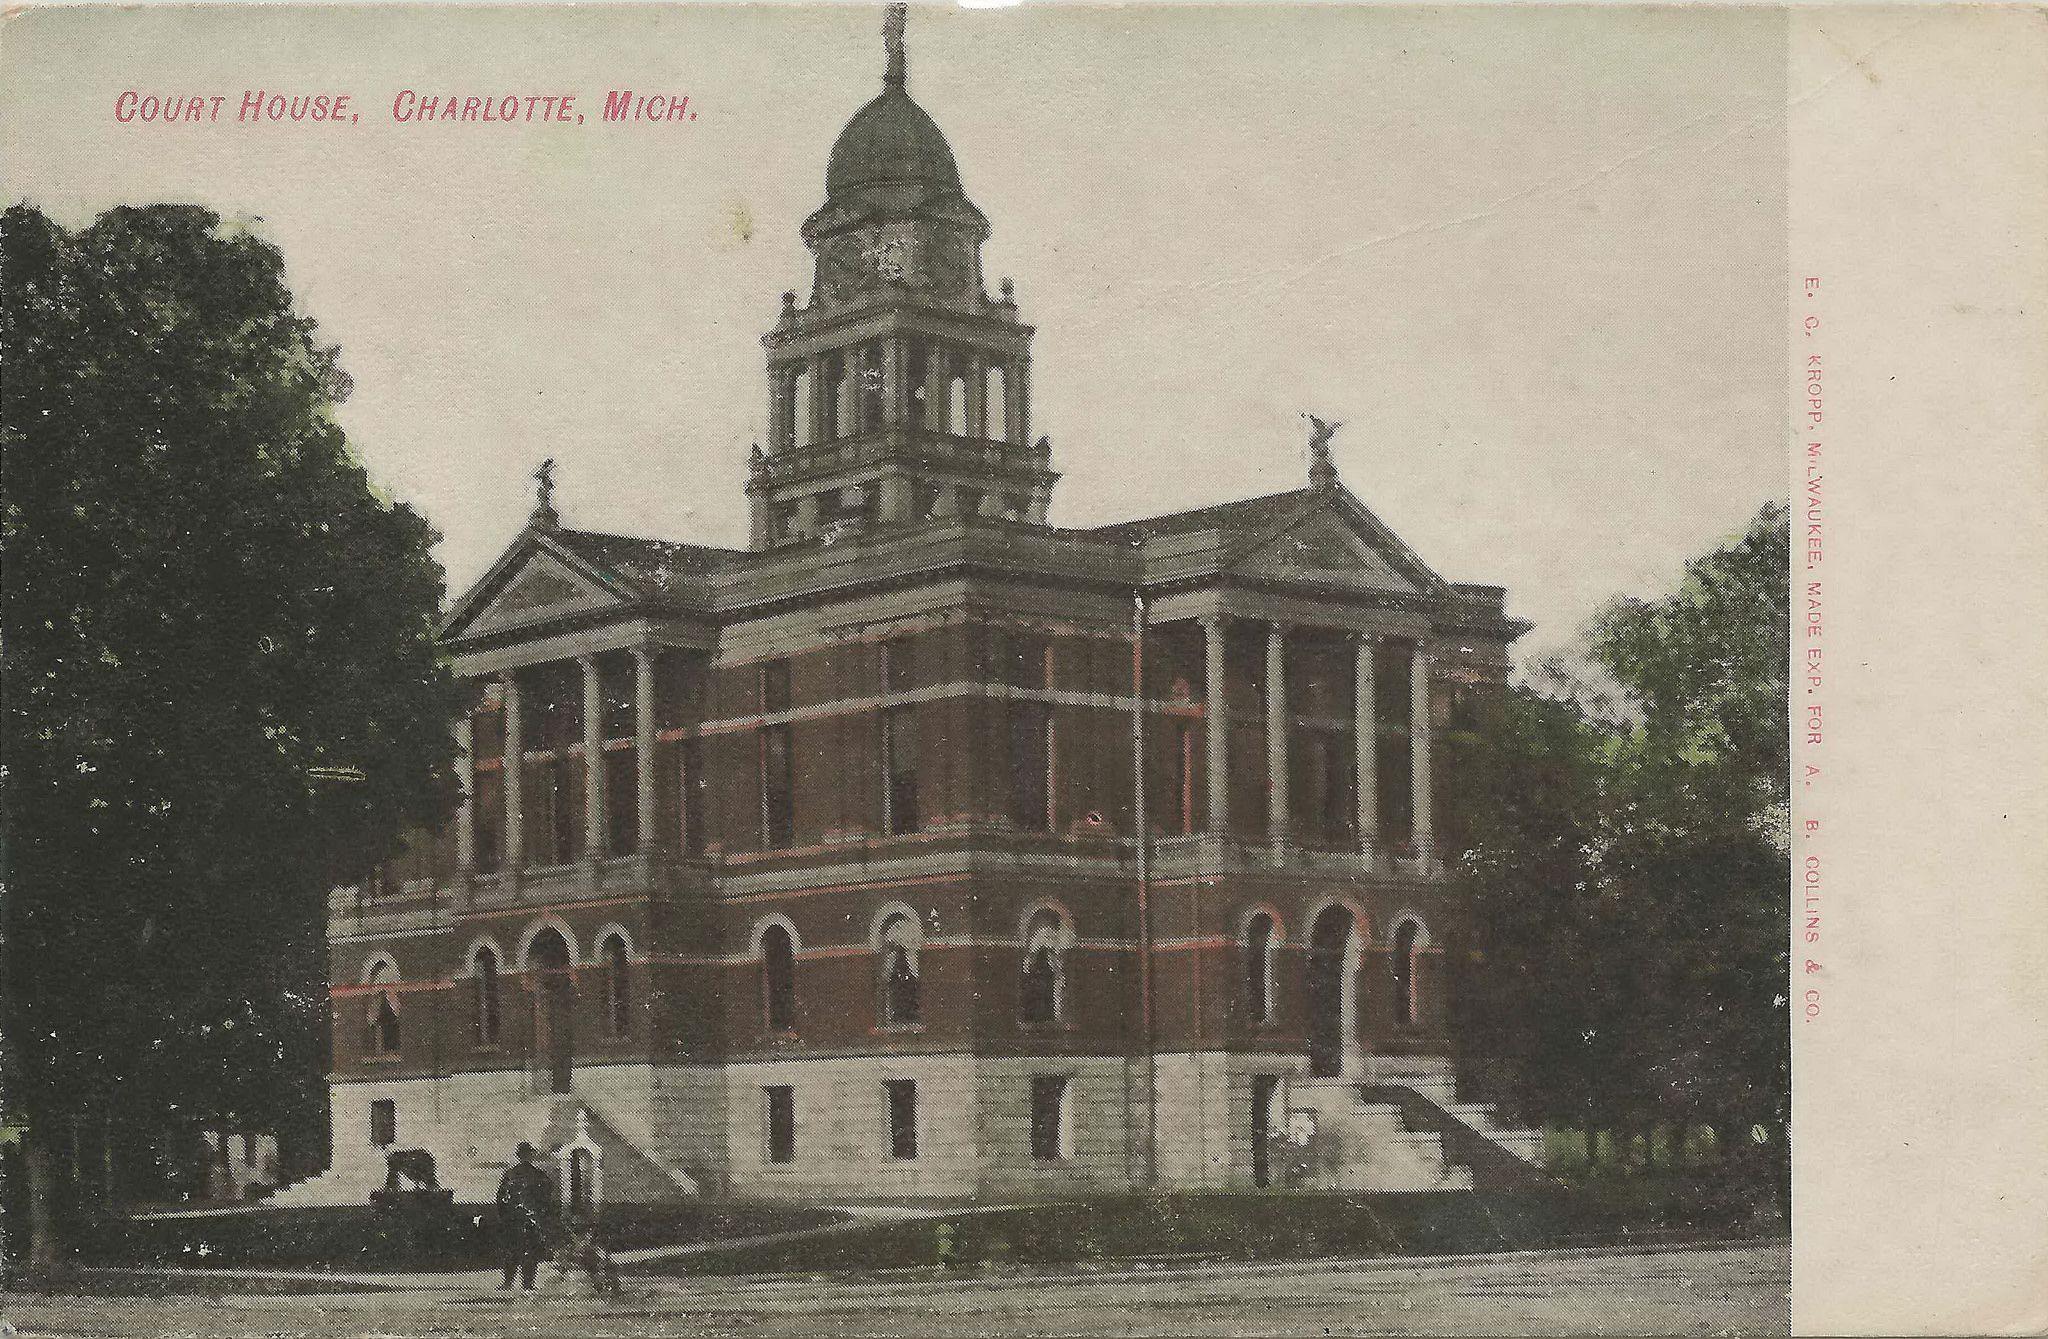 Michigan eaton county potterville - Sw Charlotte Mi Eaton County Courthouse Built On 1885 Rebu